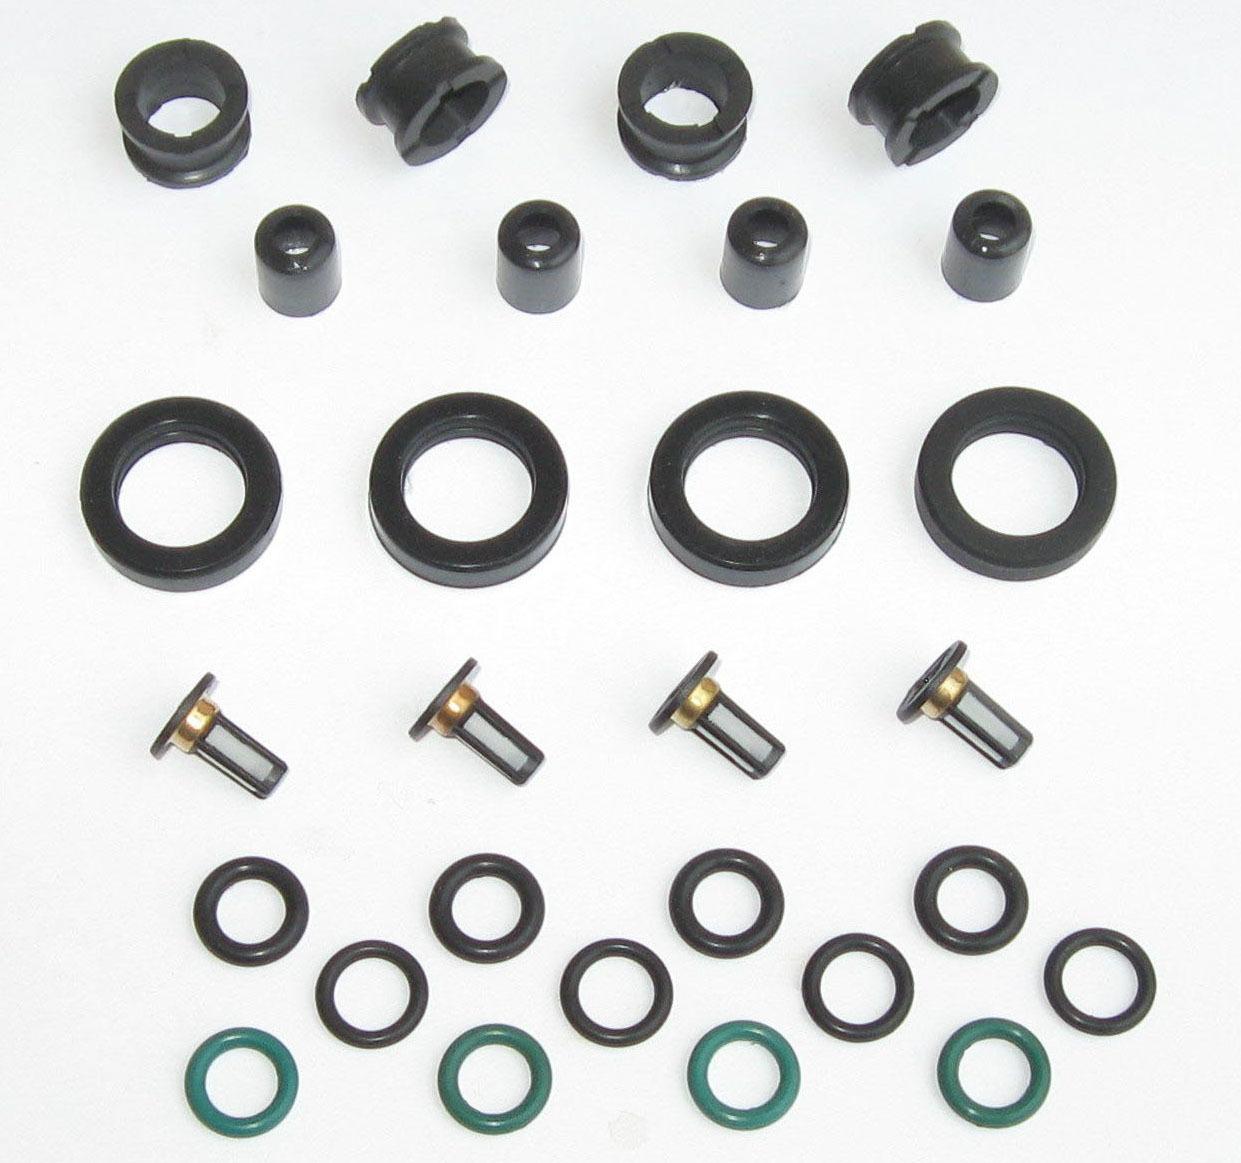 V6 Fuel Injector Service Repair Kit O-Rings Filters Seals Pintle Caps